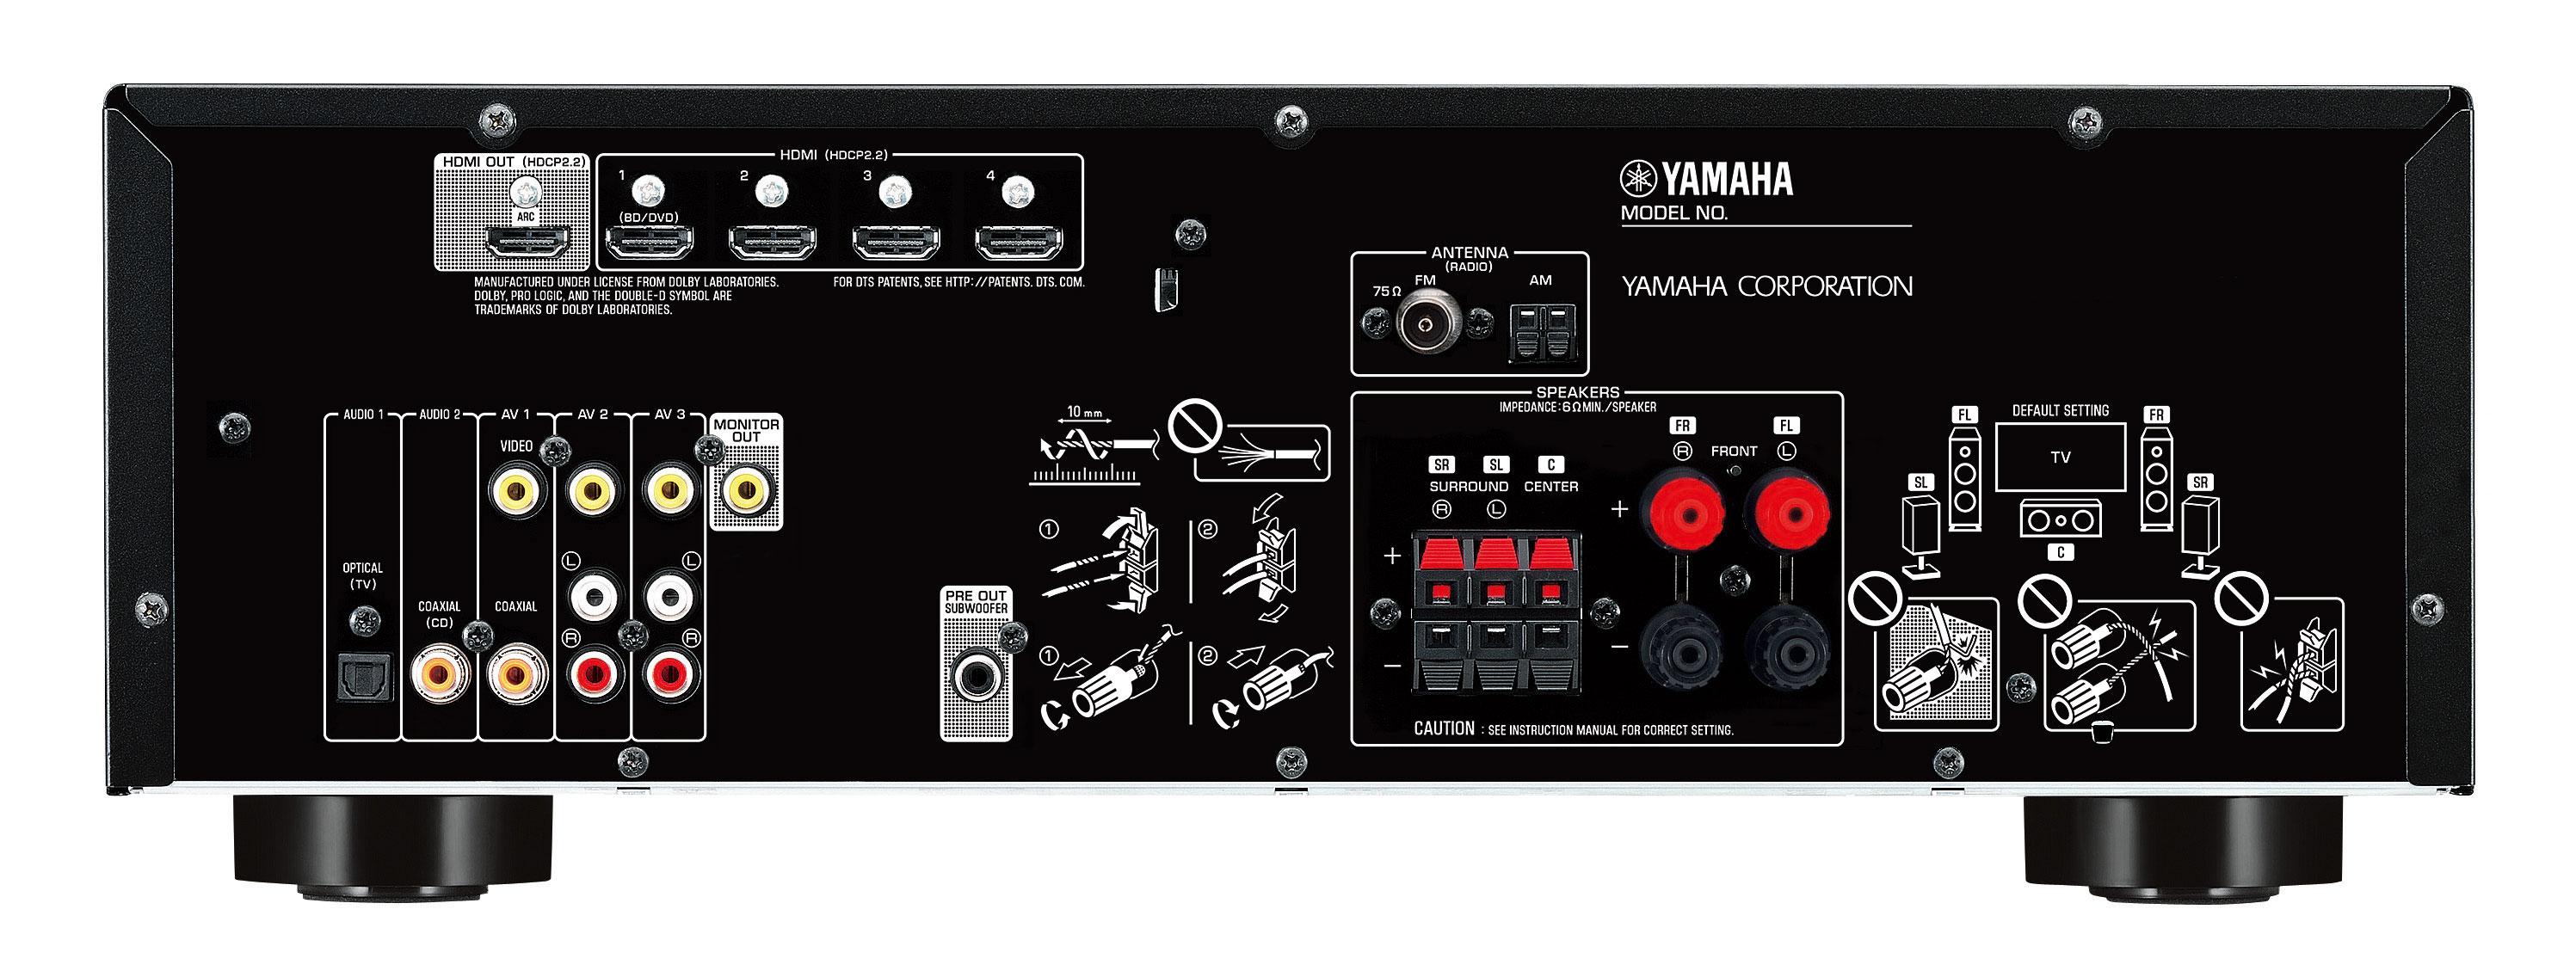 Yamaha RX-V383 bag